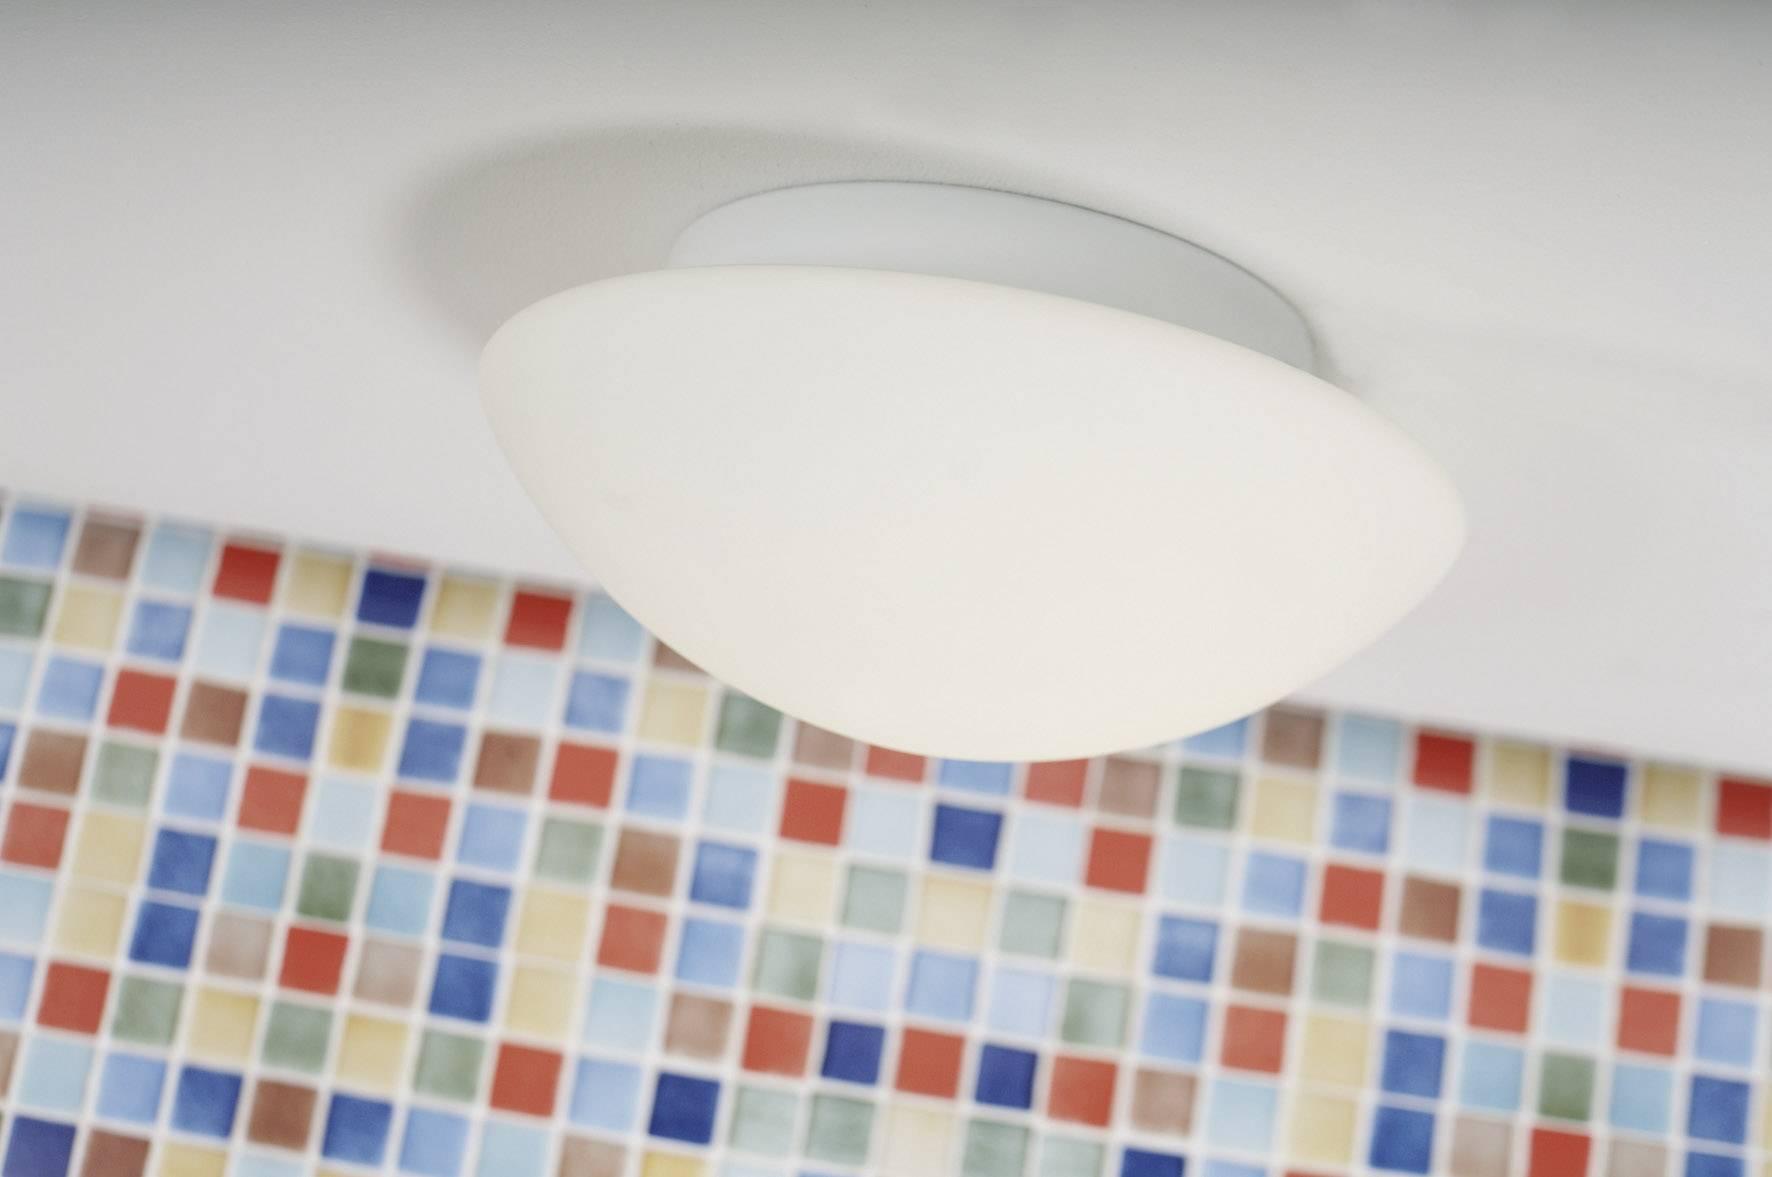 Badkamer Plafondlamp Led : Badkamer plafondlamp halogeen led e w nordlux ufo maxi